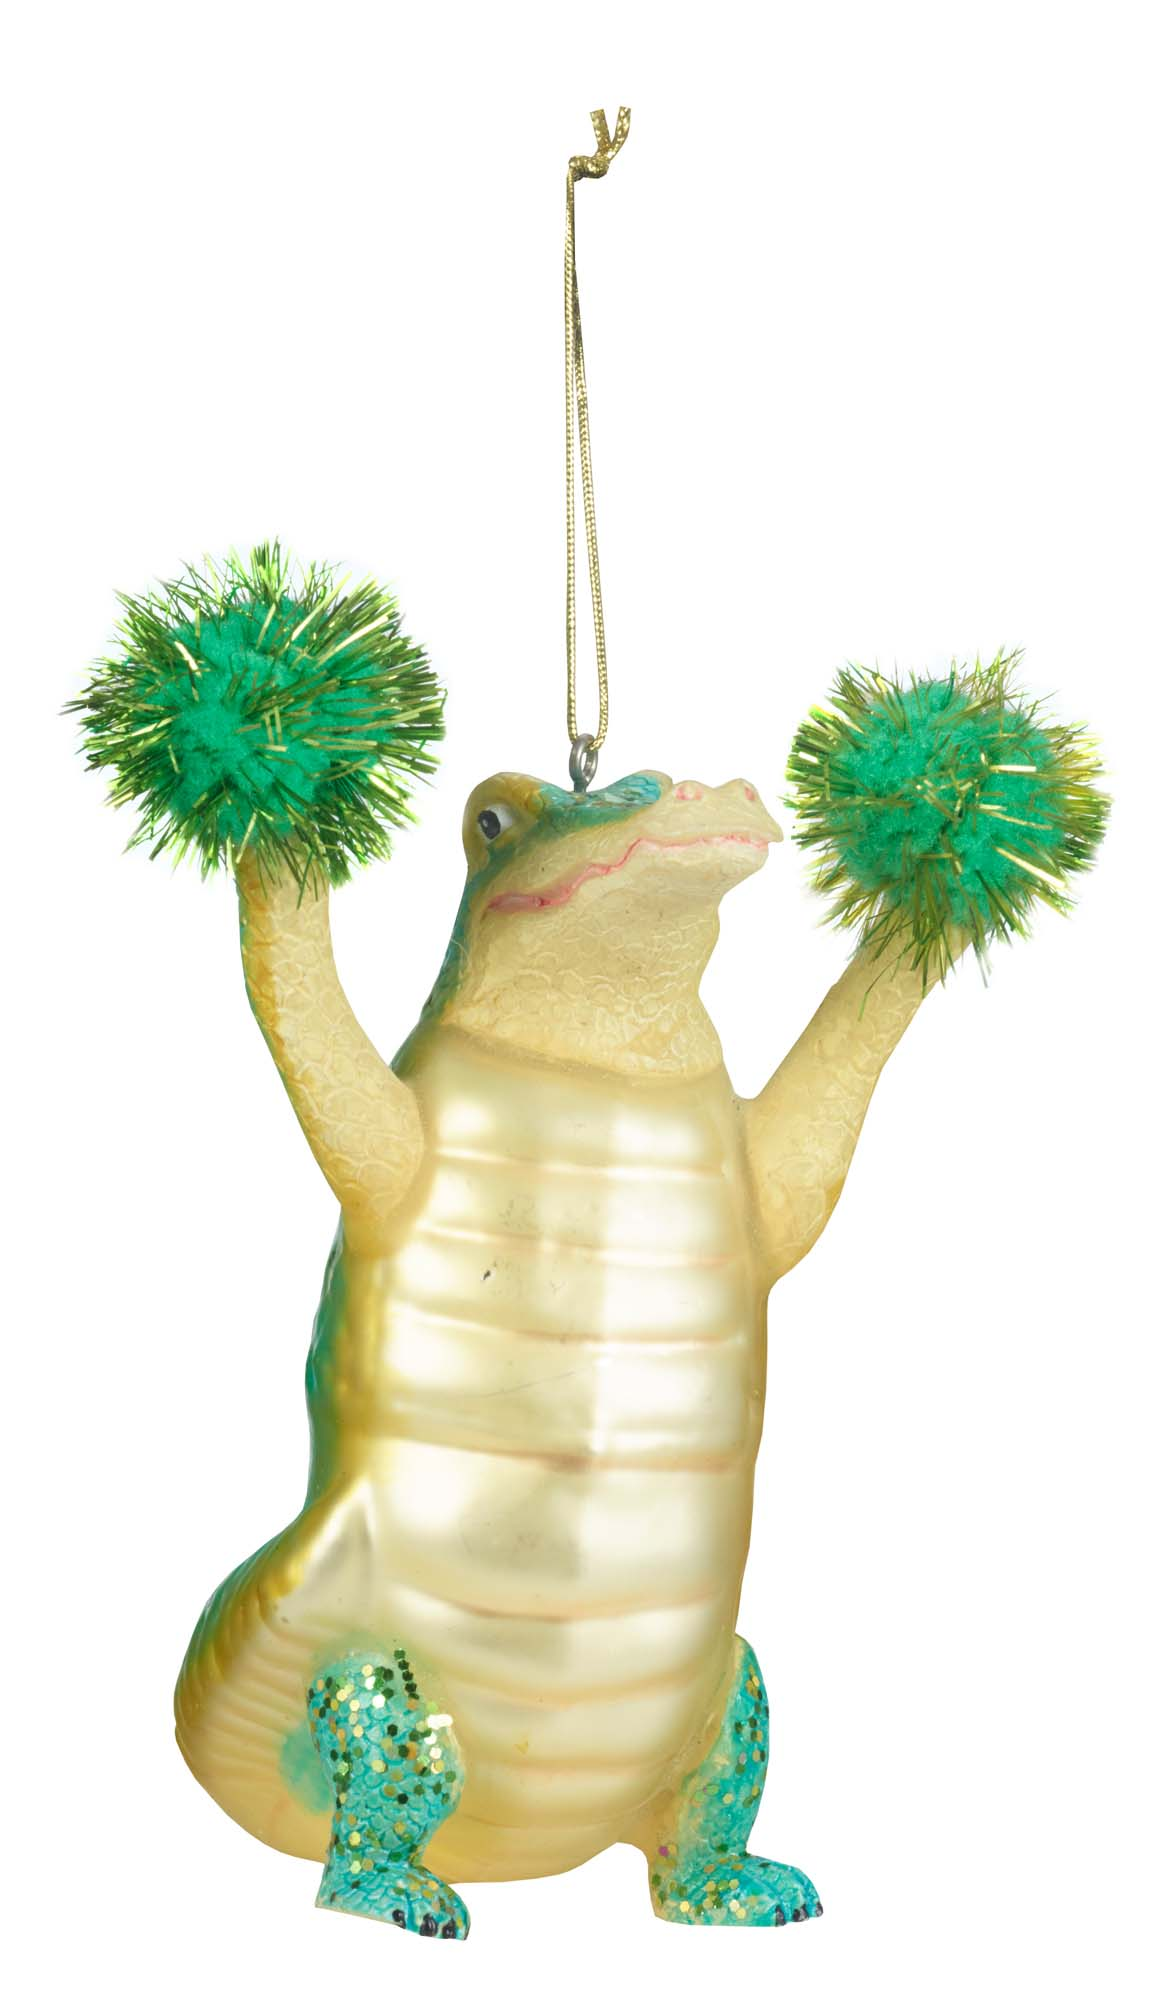 Paperchase's cheerleading alligator